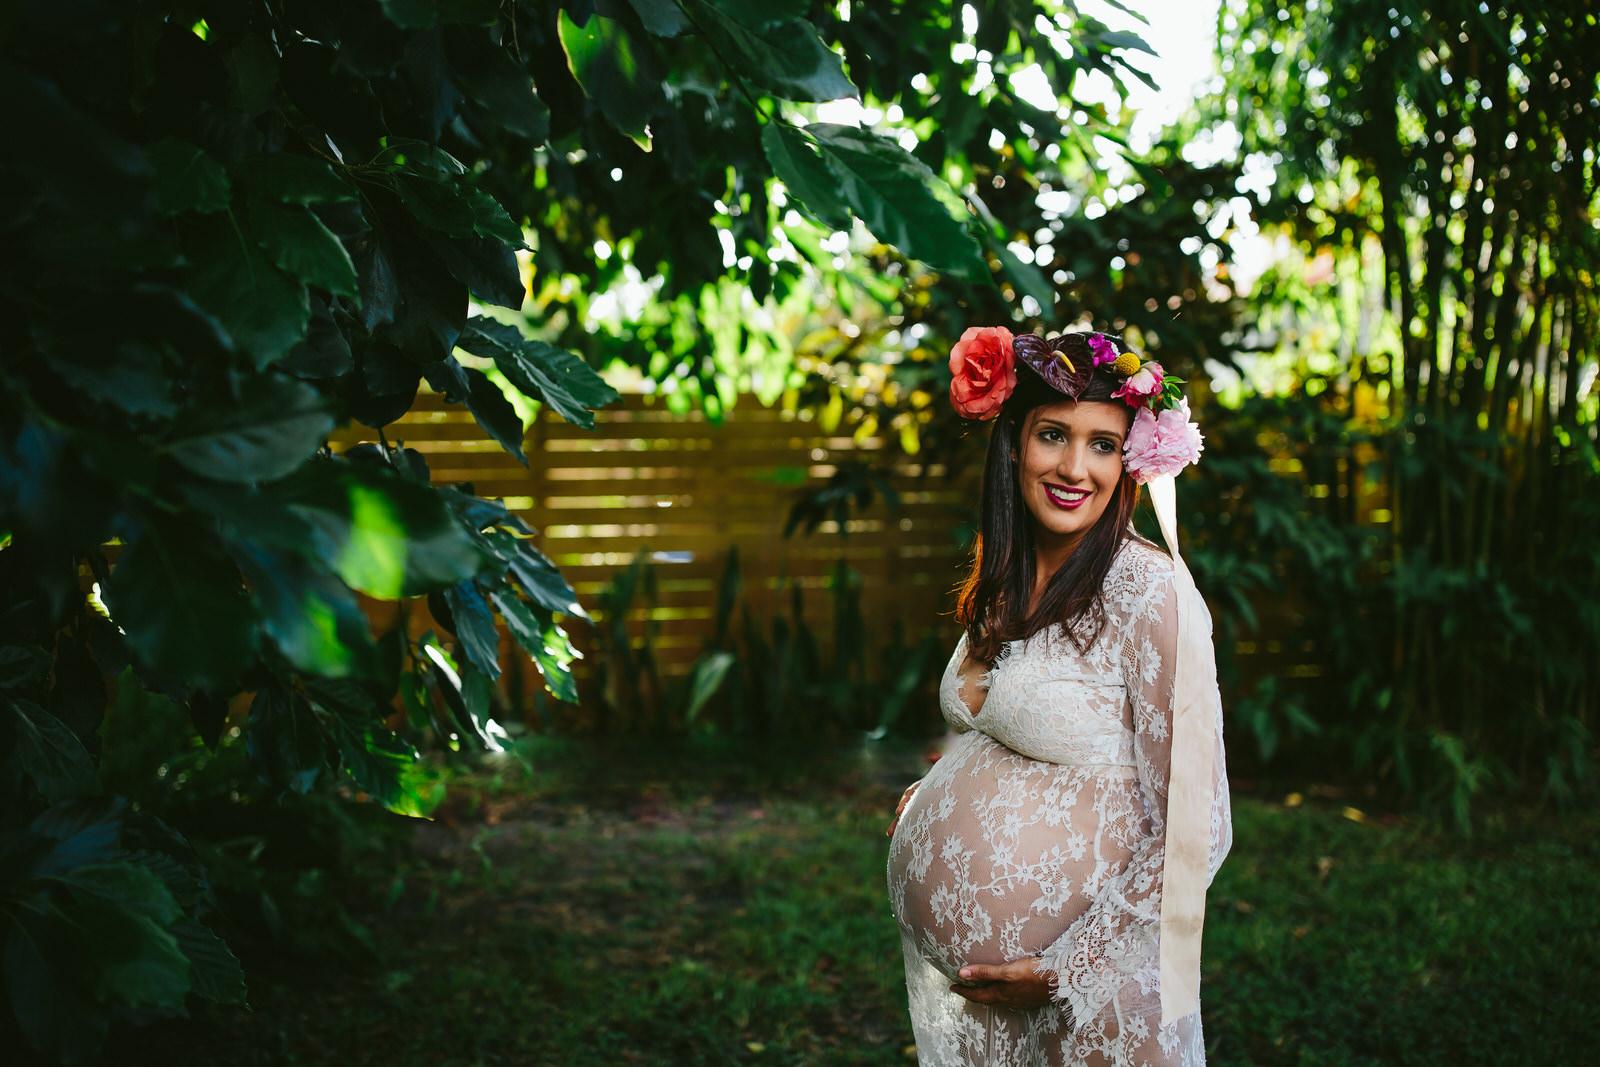 pregnancy-portraits-steph-lynn-photo-82.jpg